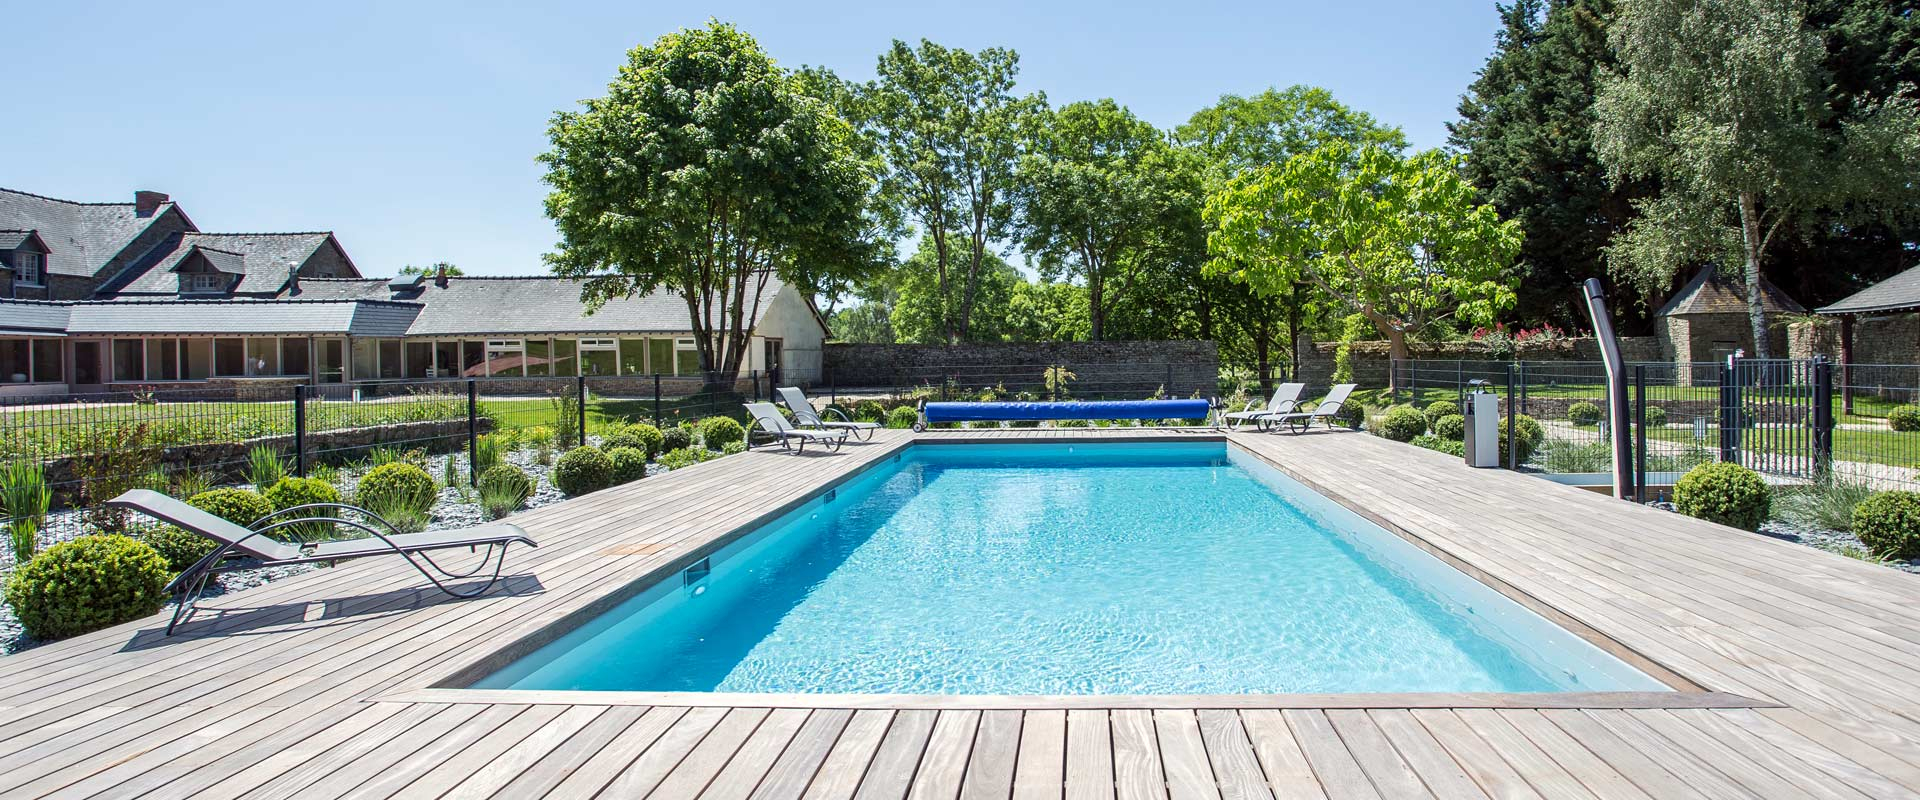 Hotel With Swiming Pool - Hotel De L'abbaye Le Tronchet serapportantà Hotel Avec Piscine Ile De France